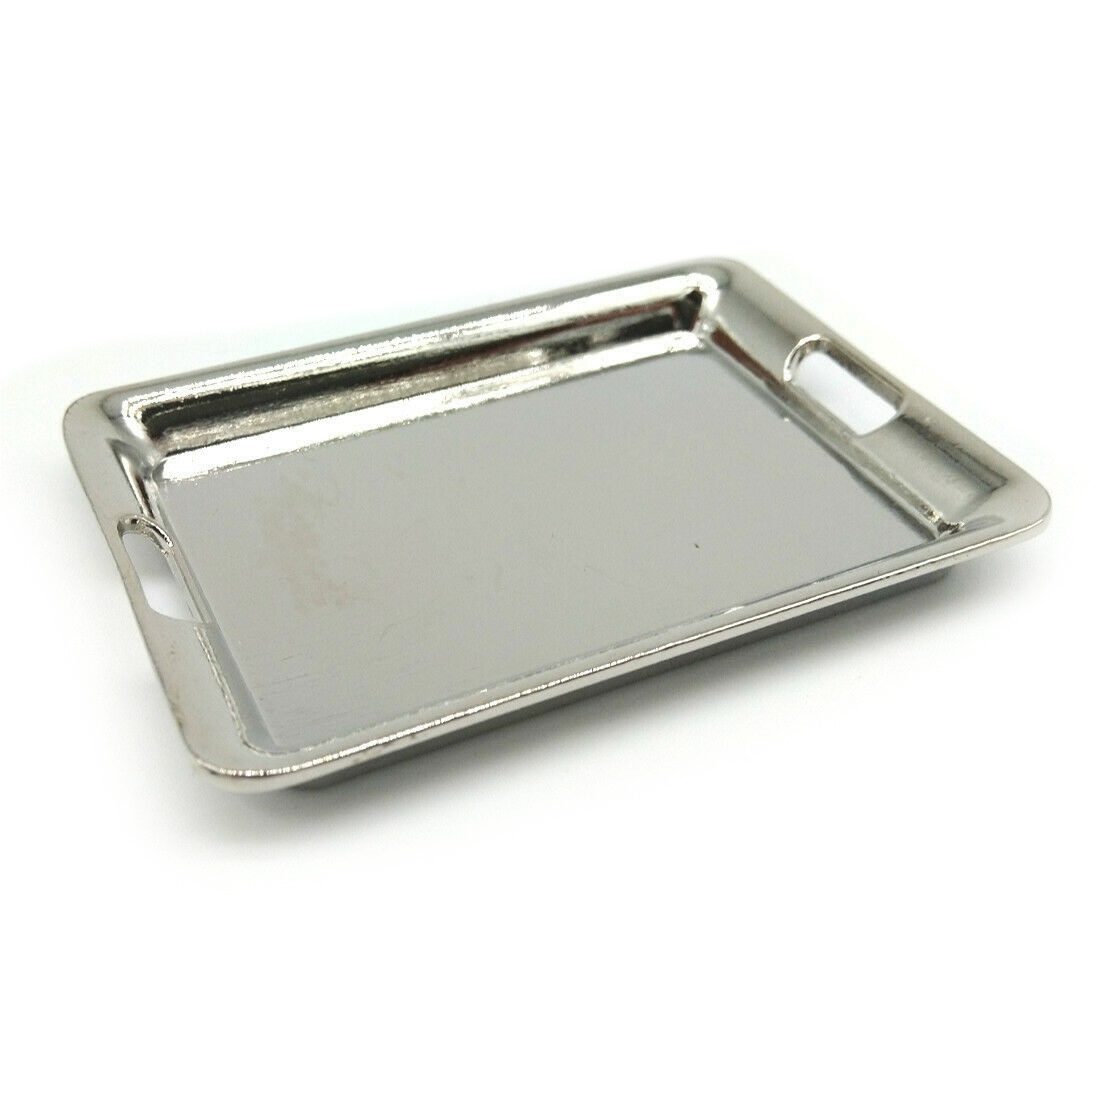 Dollhouse Kitchen Cookware Tray Salver 1:6 Miniature Accessories Bronze